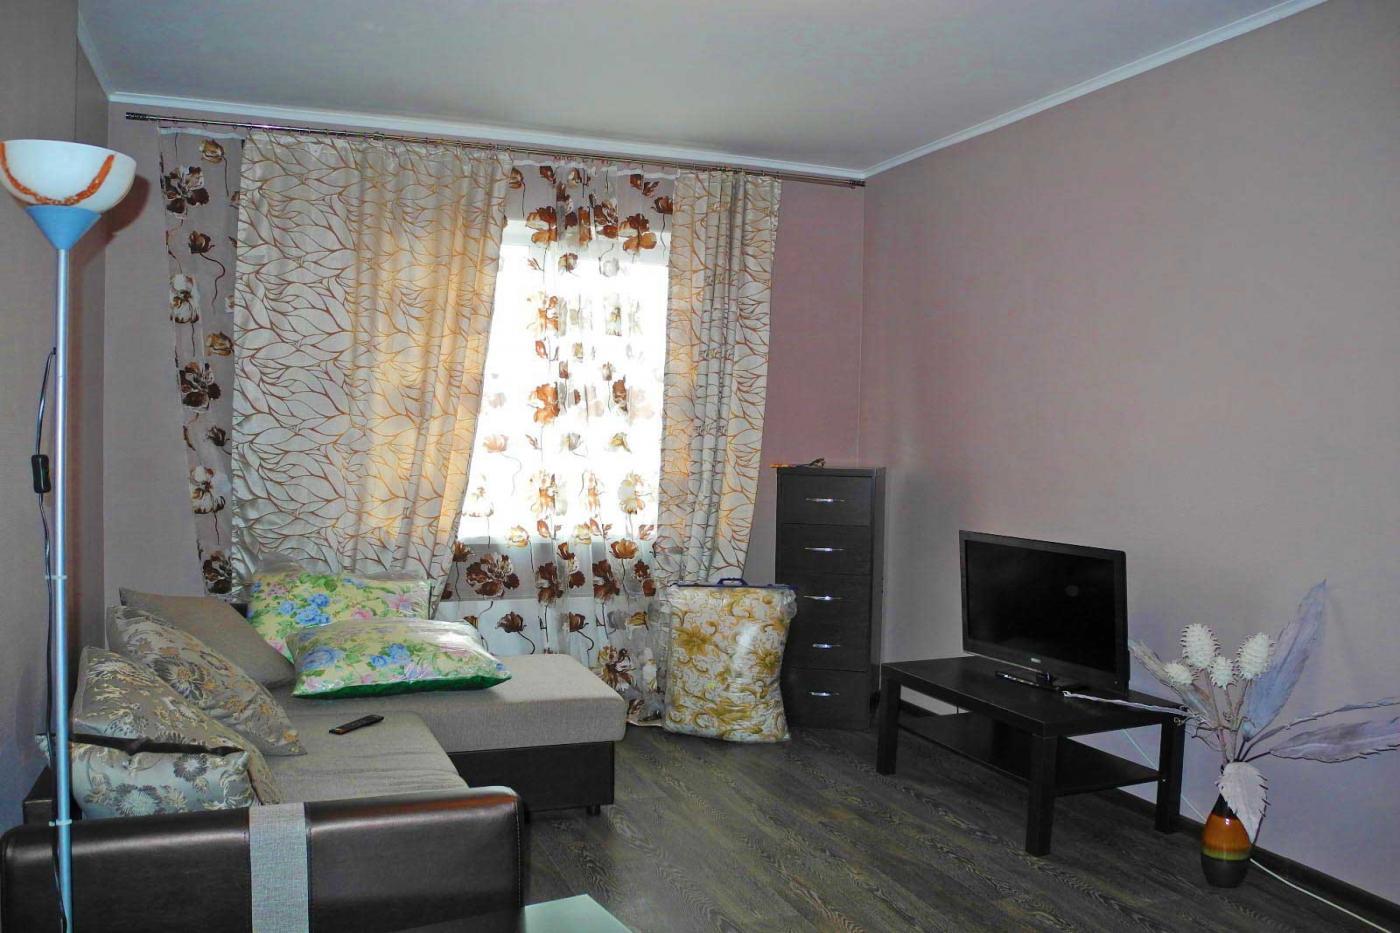 1-комнатная квартира посуточно (вариант № 3875), ул. Ленинский проспект, фото № 1